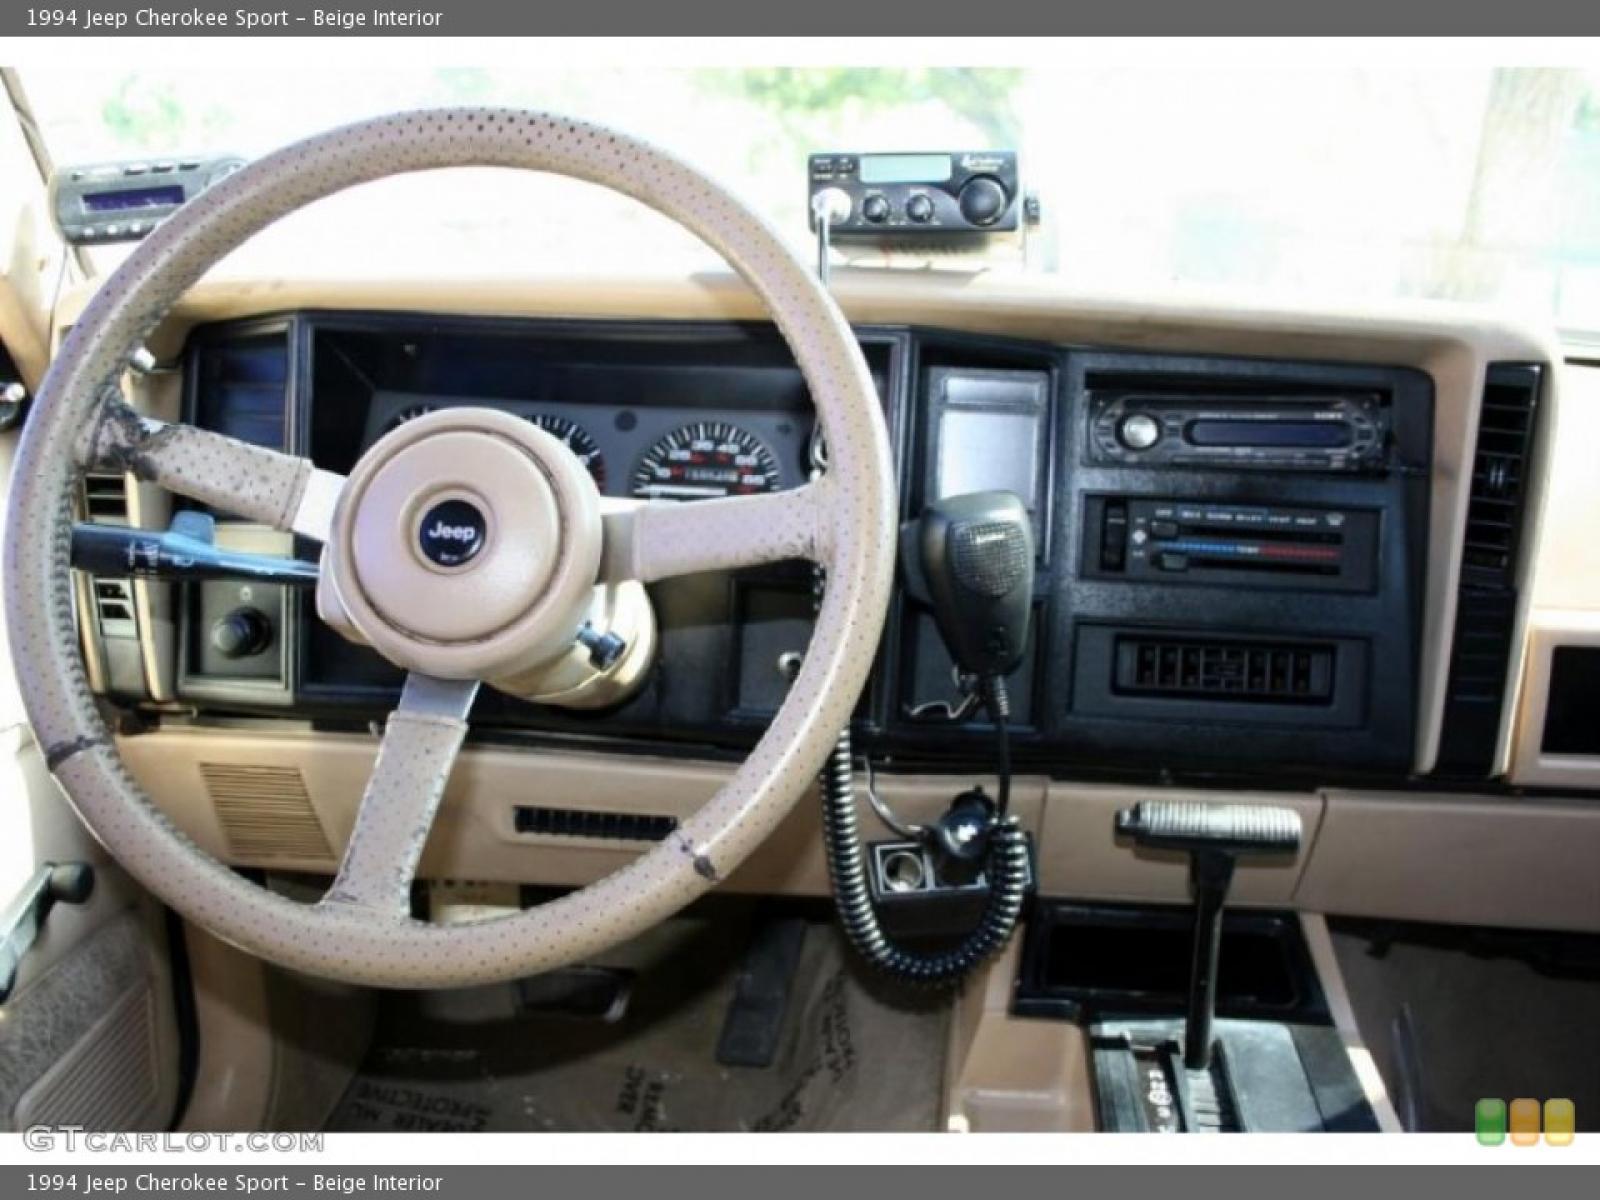 800 1024 1280 1600 Origin 1994 Jeep Cherokee ...